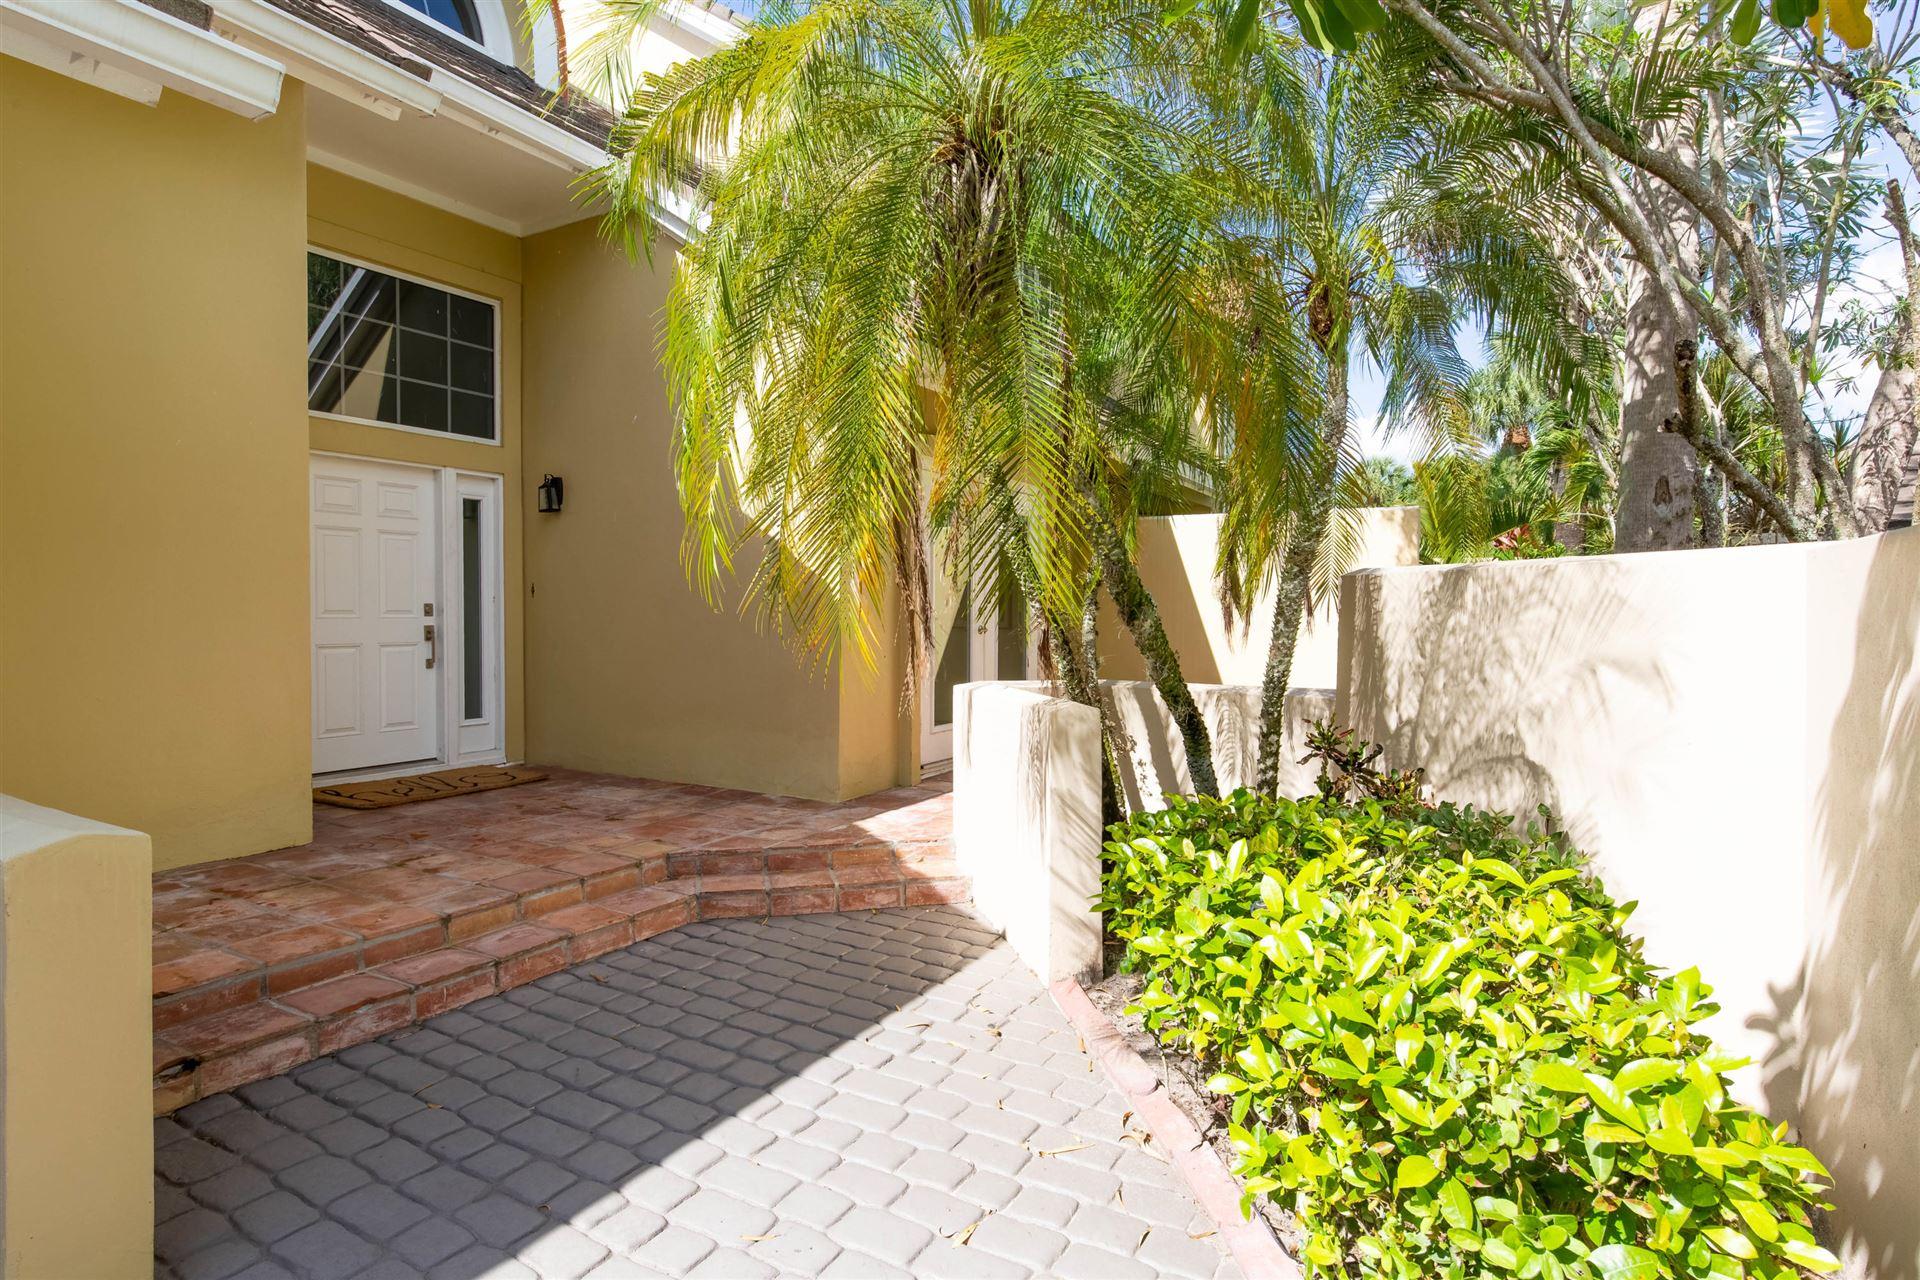 Photo of 2627 Muirfield Court, Wellington, FL 33414 (MLS # RX-10636395)